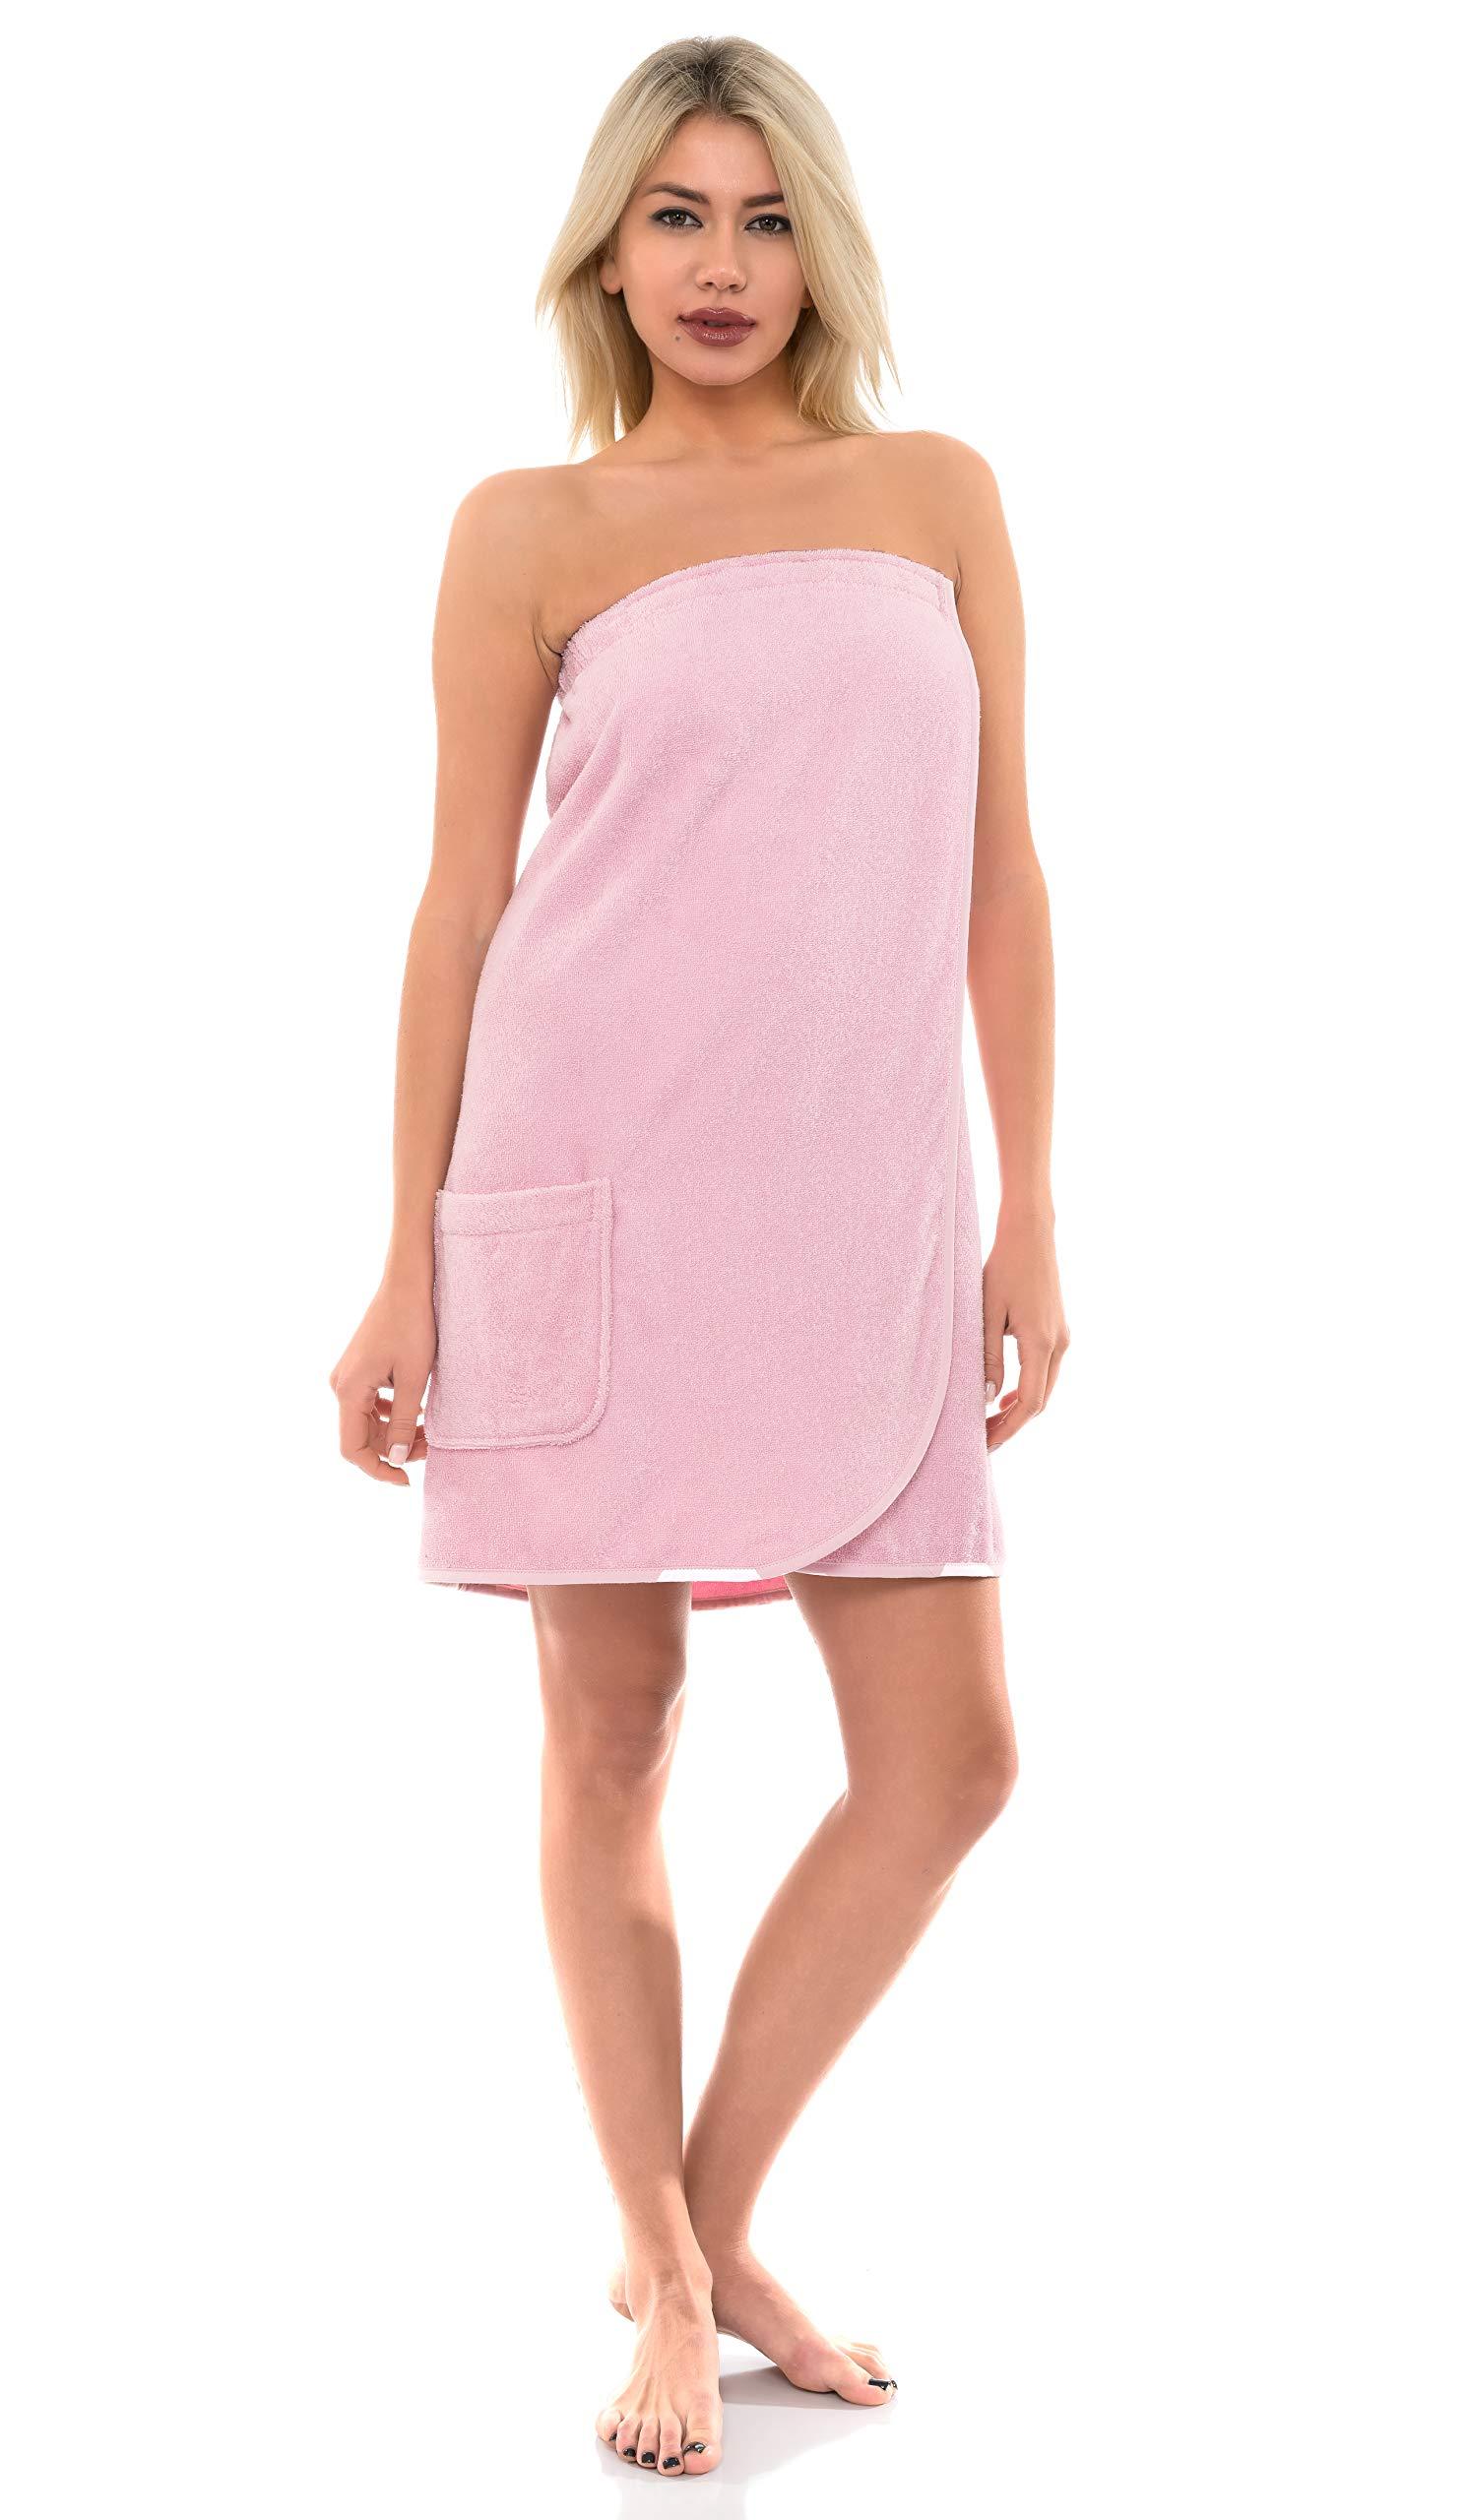 TowelSelections Women's Wrap, Shower & Bath, Terry Spa Towel